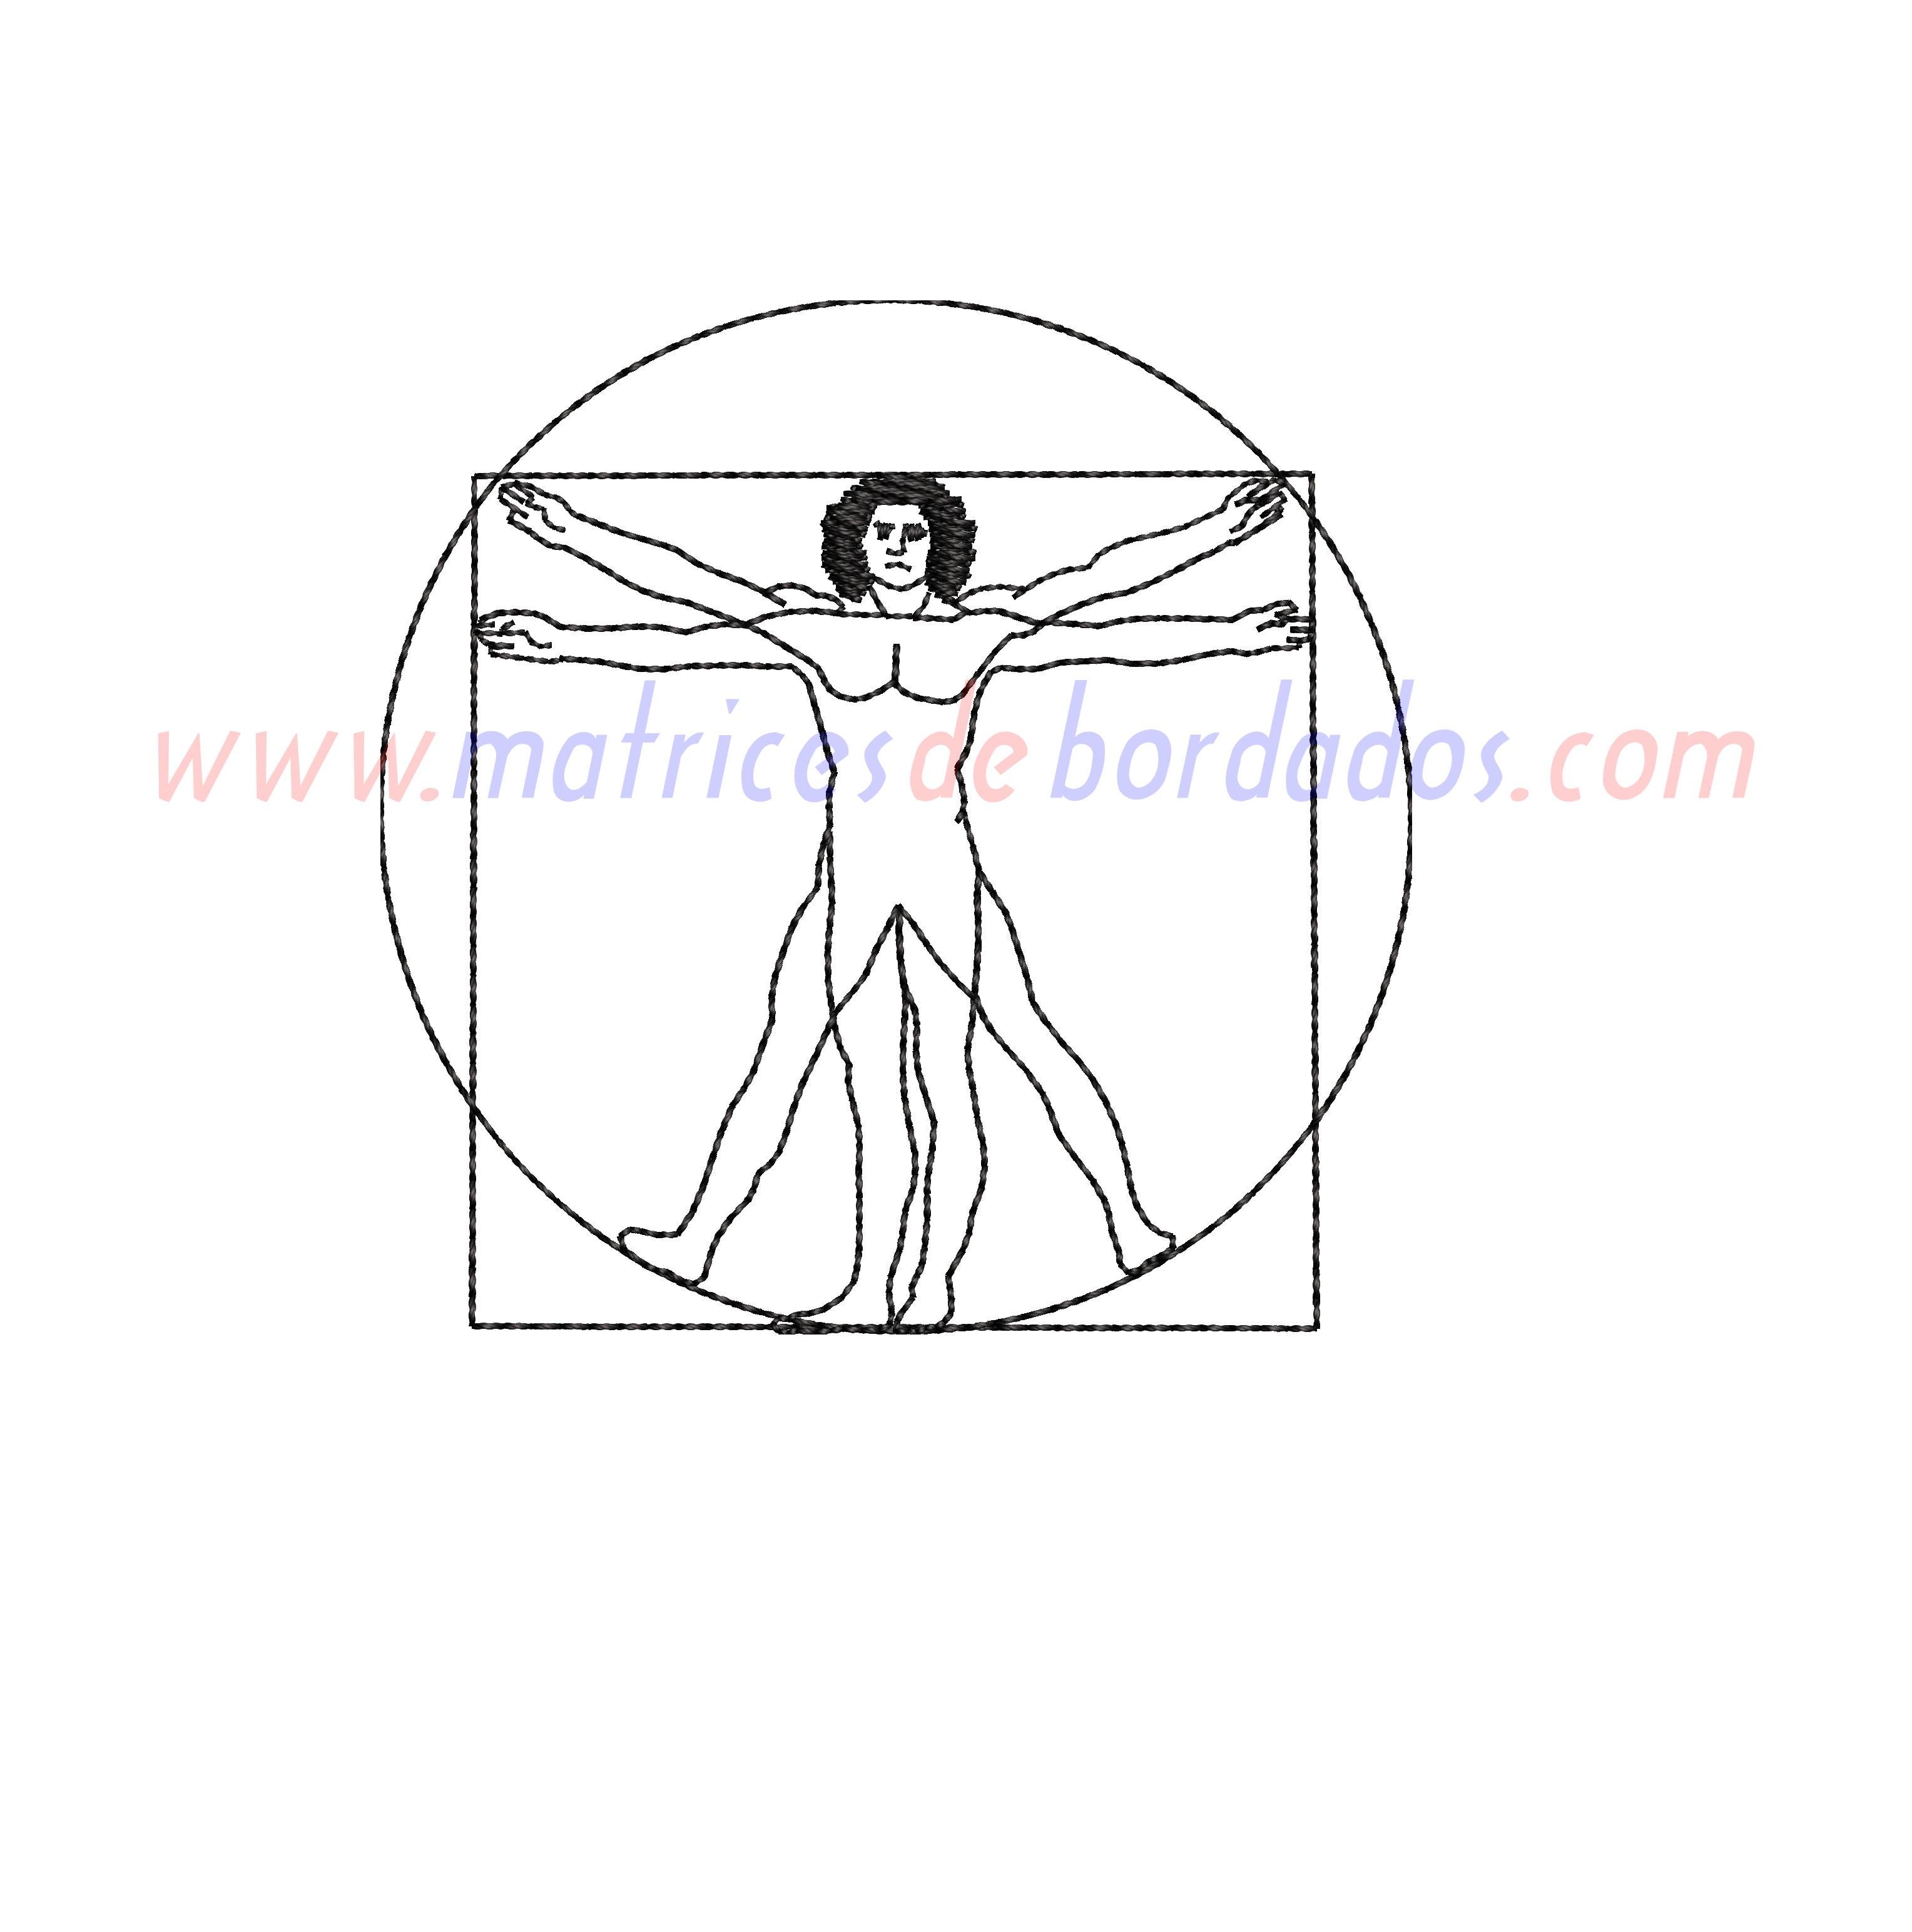 LQ46GK - Hombre de Vitruvio Da Vinci